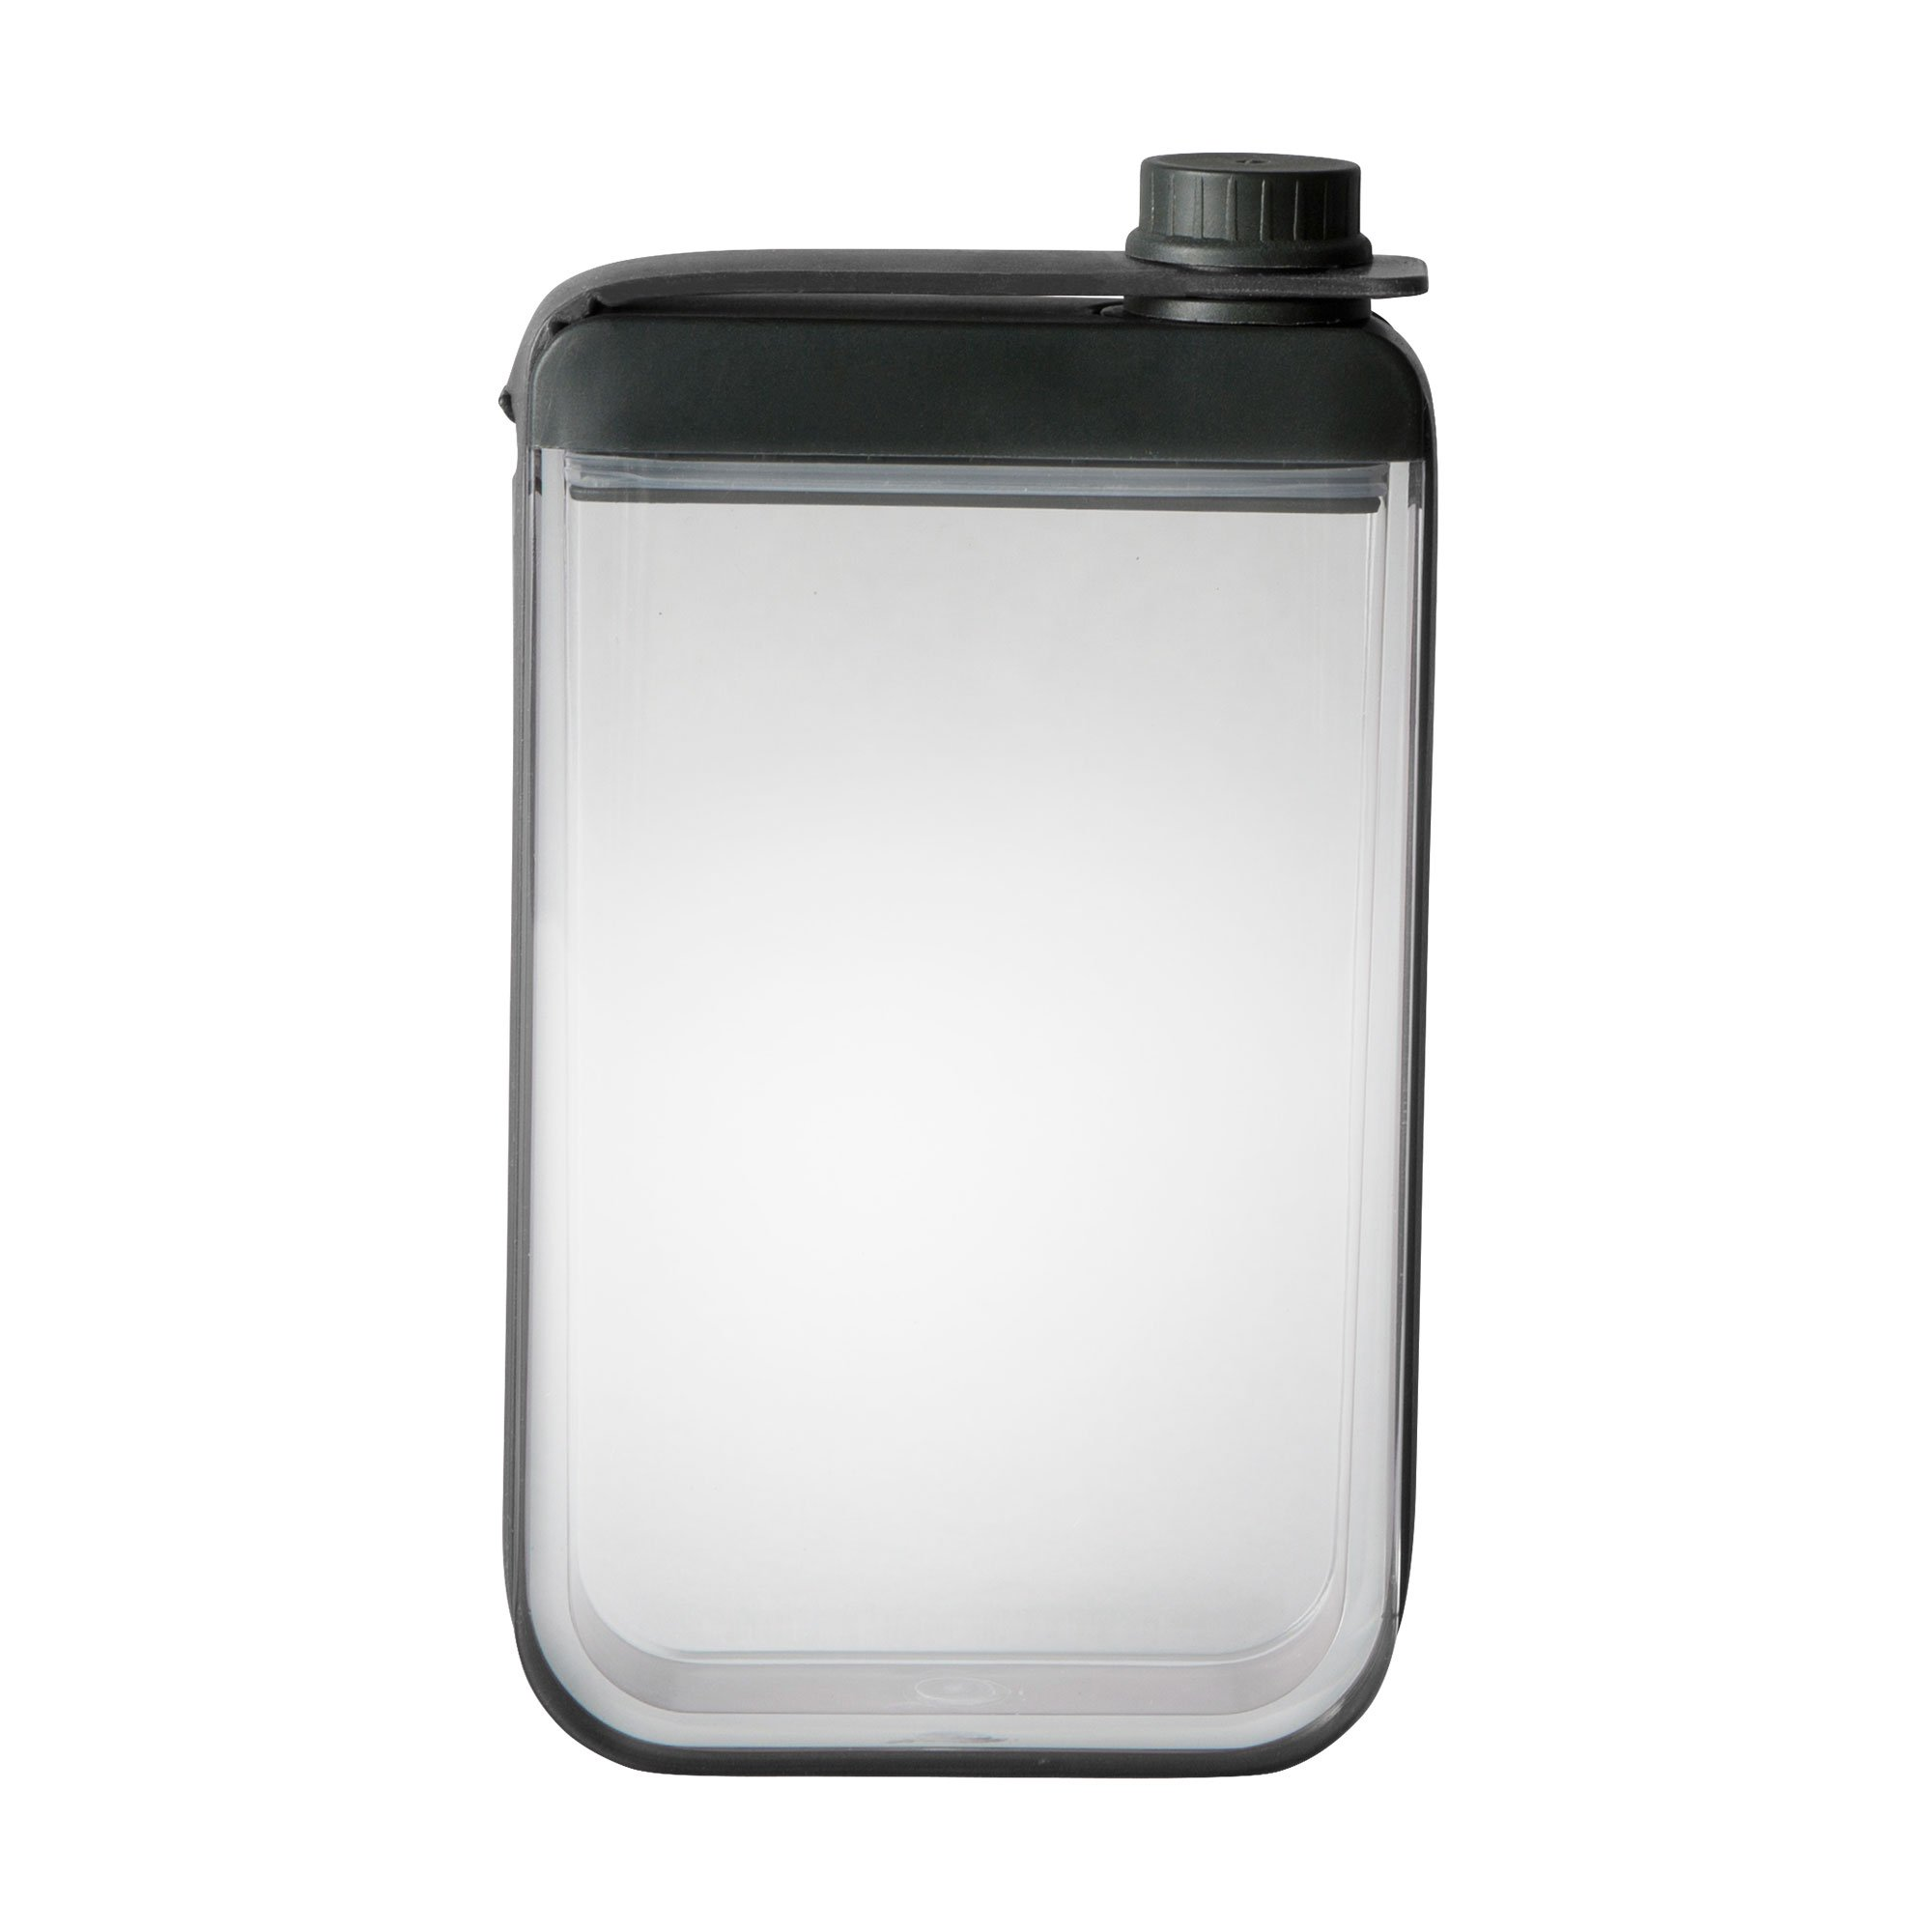 Rabbit Leak Free Discreet Flask, Black by Rabbit